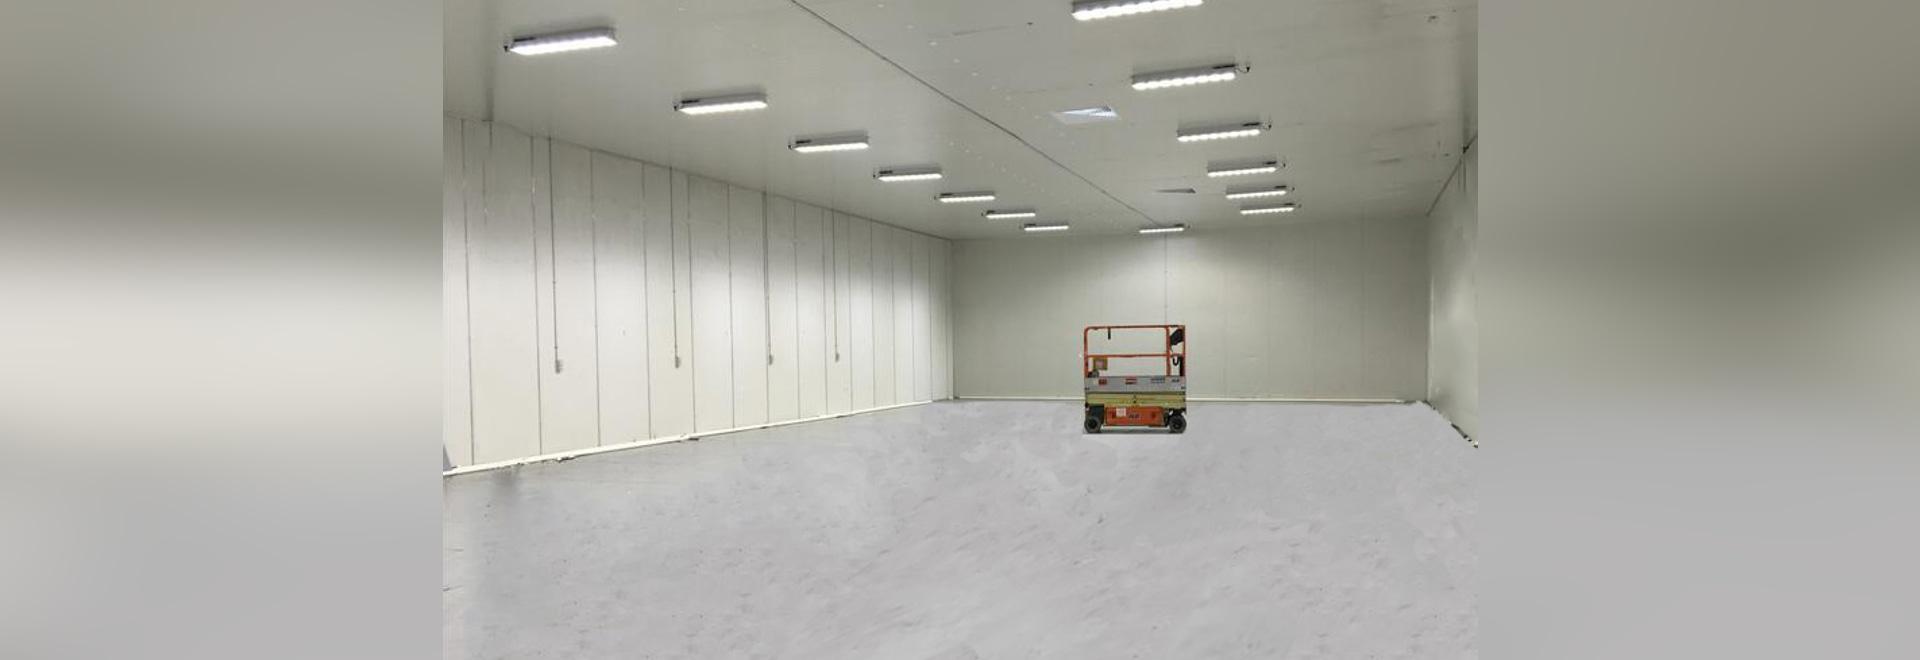 Lumiway Led Linear High Bay Light In Workshop New Zealand Shenzhen Guangdong China Yaham Optoelectronics Co Ltd